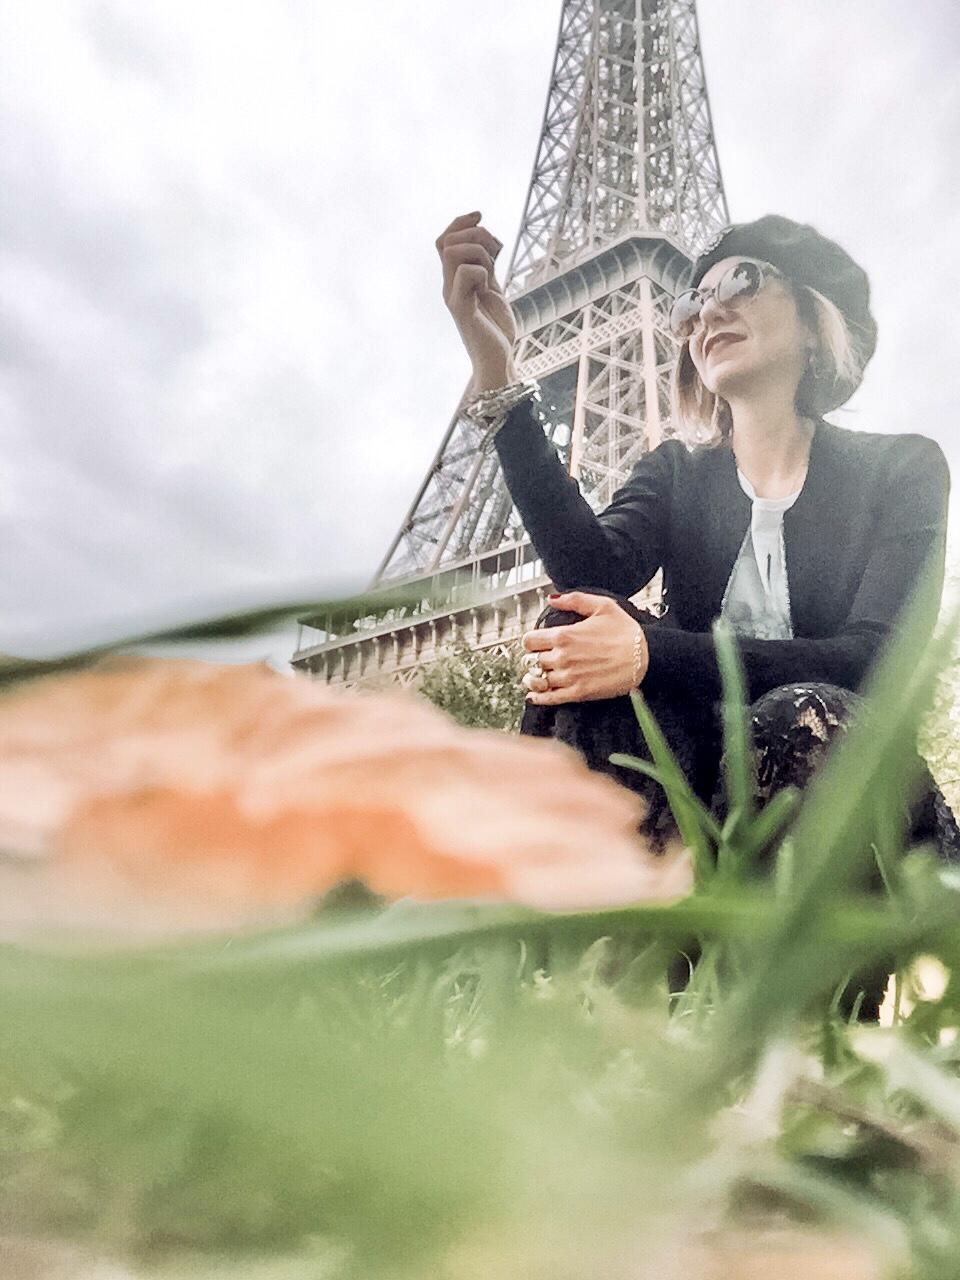 Parigi in autunno, jardin de luxembourg, Impastastorie, impastastorie bistrot, autumn in paris, Champ de Mars, Tour eiffel, eiffel tower in autumn